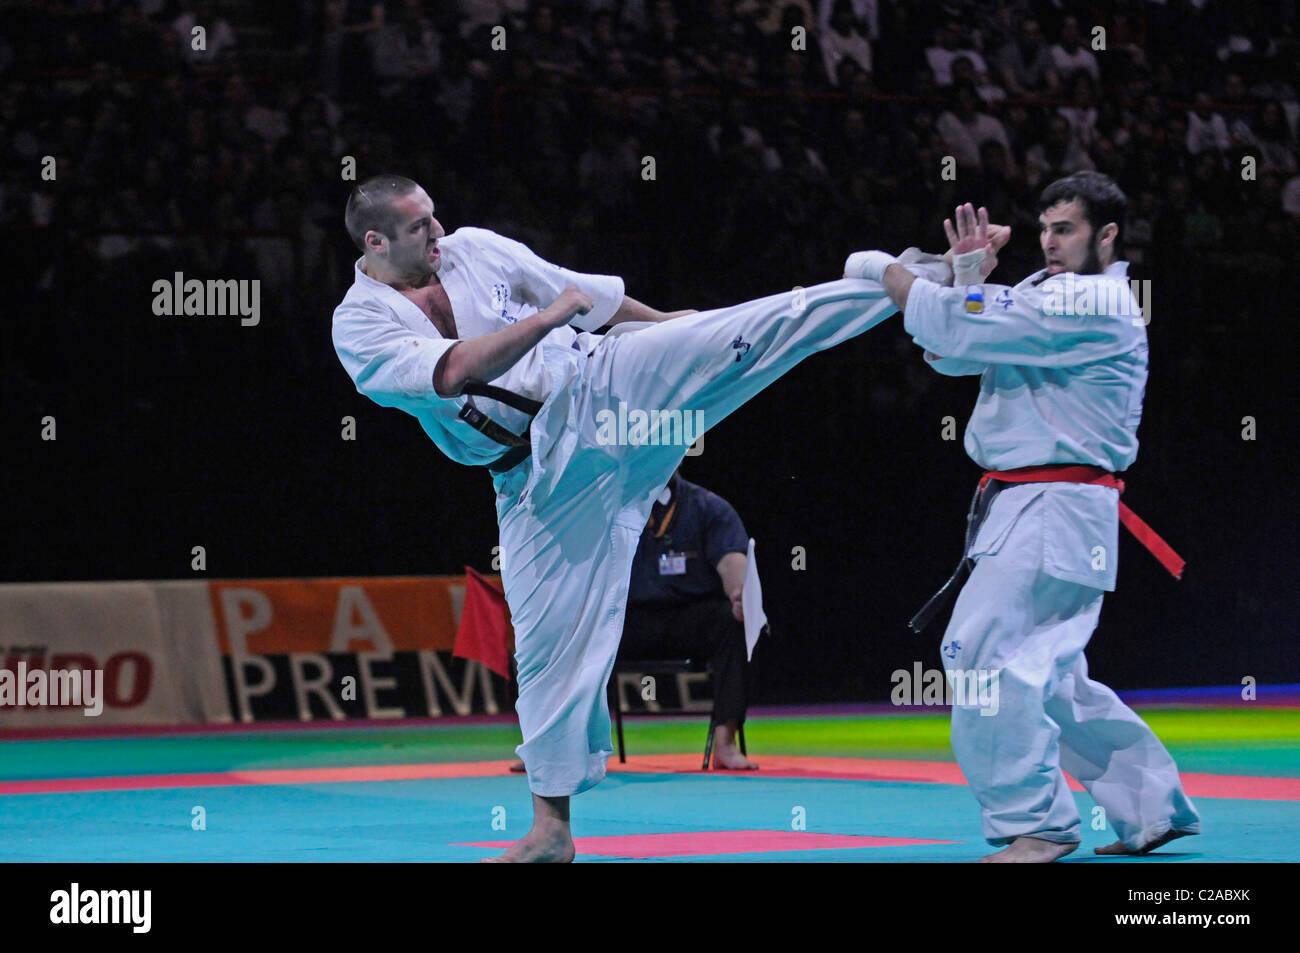 Kyokushinkai Stock Photos & Kyokushinkai Stock Images - Alamy